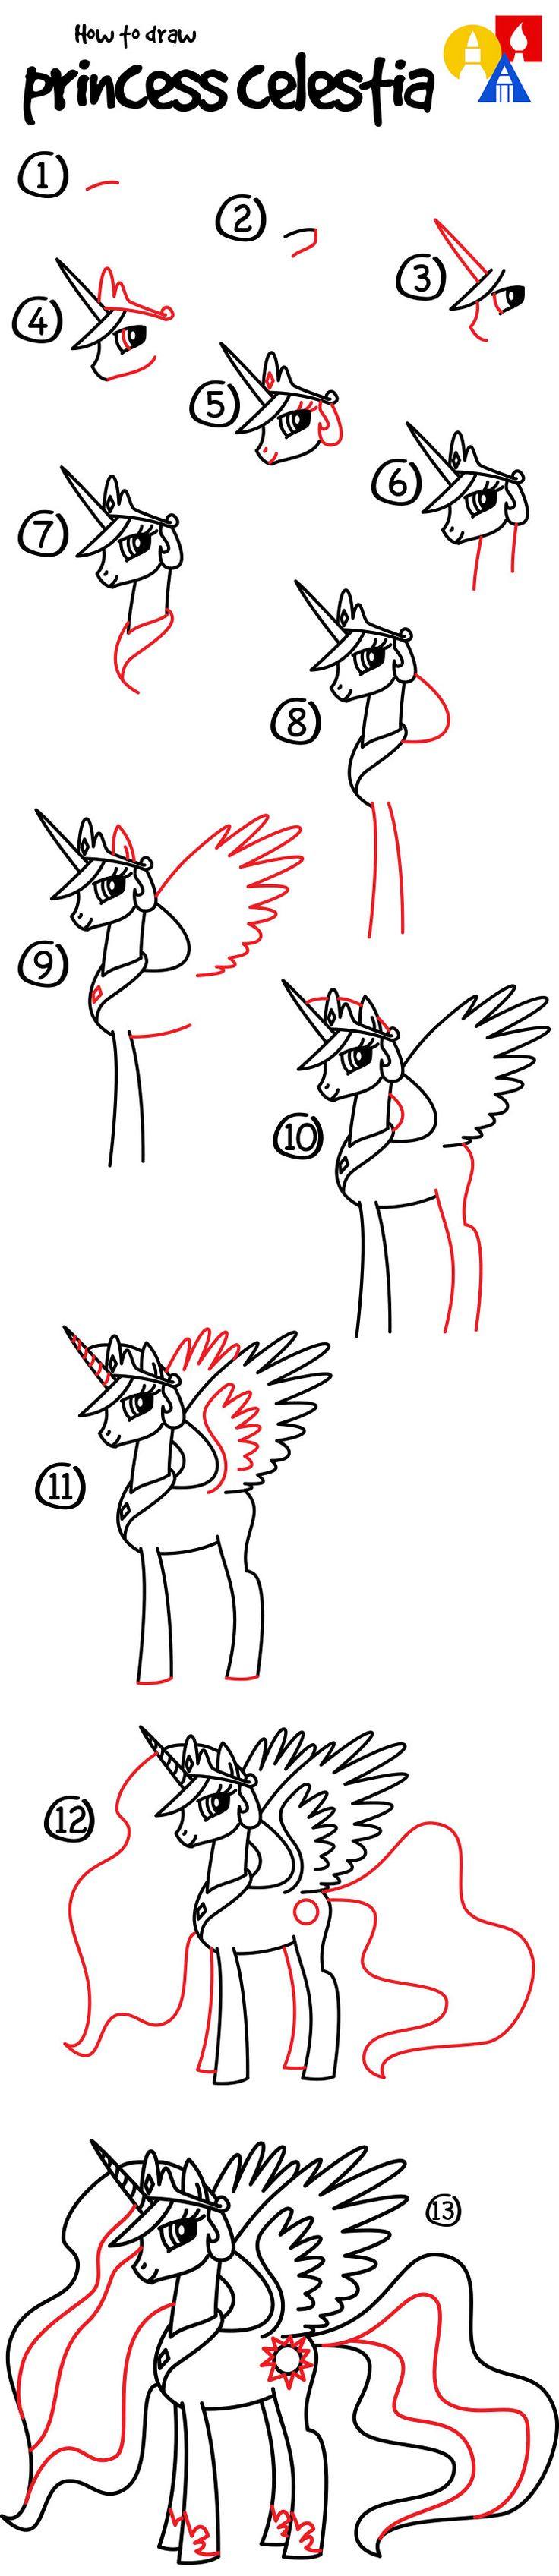 Learn how to draw Princess Celestia!